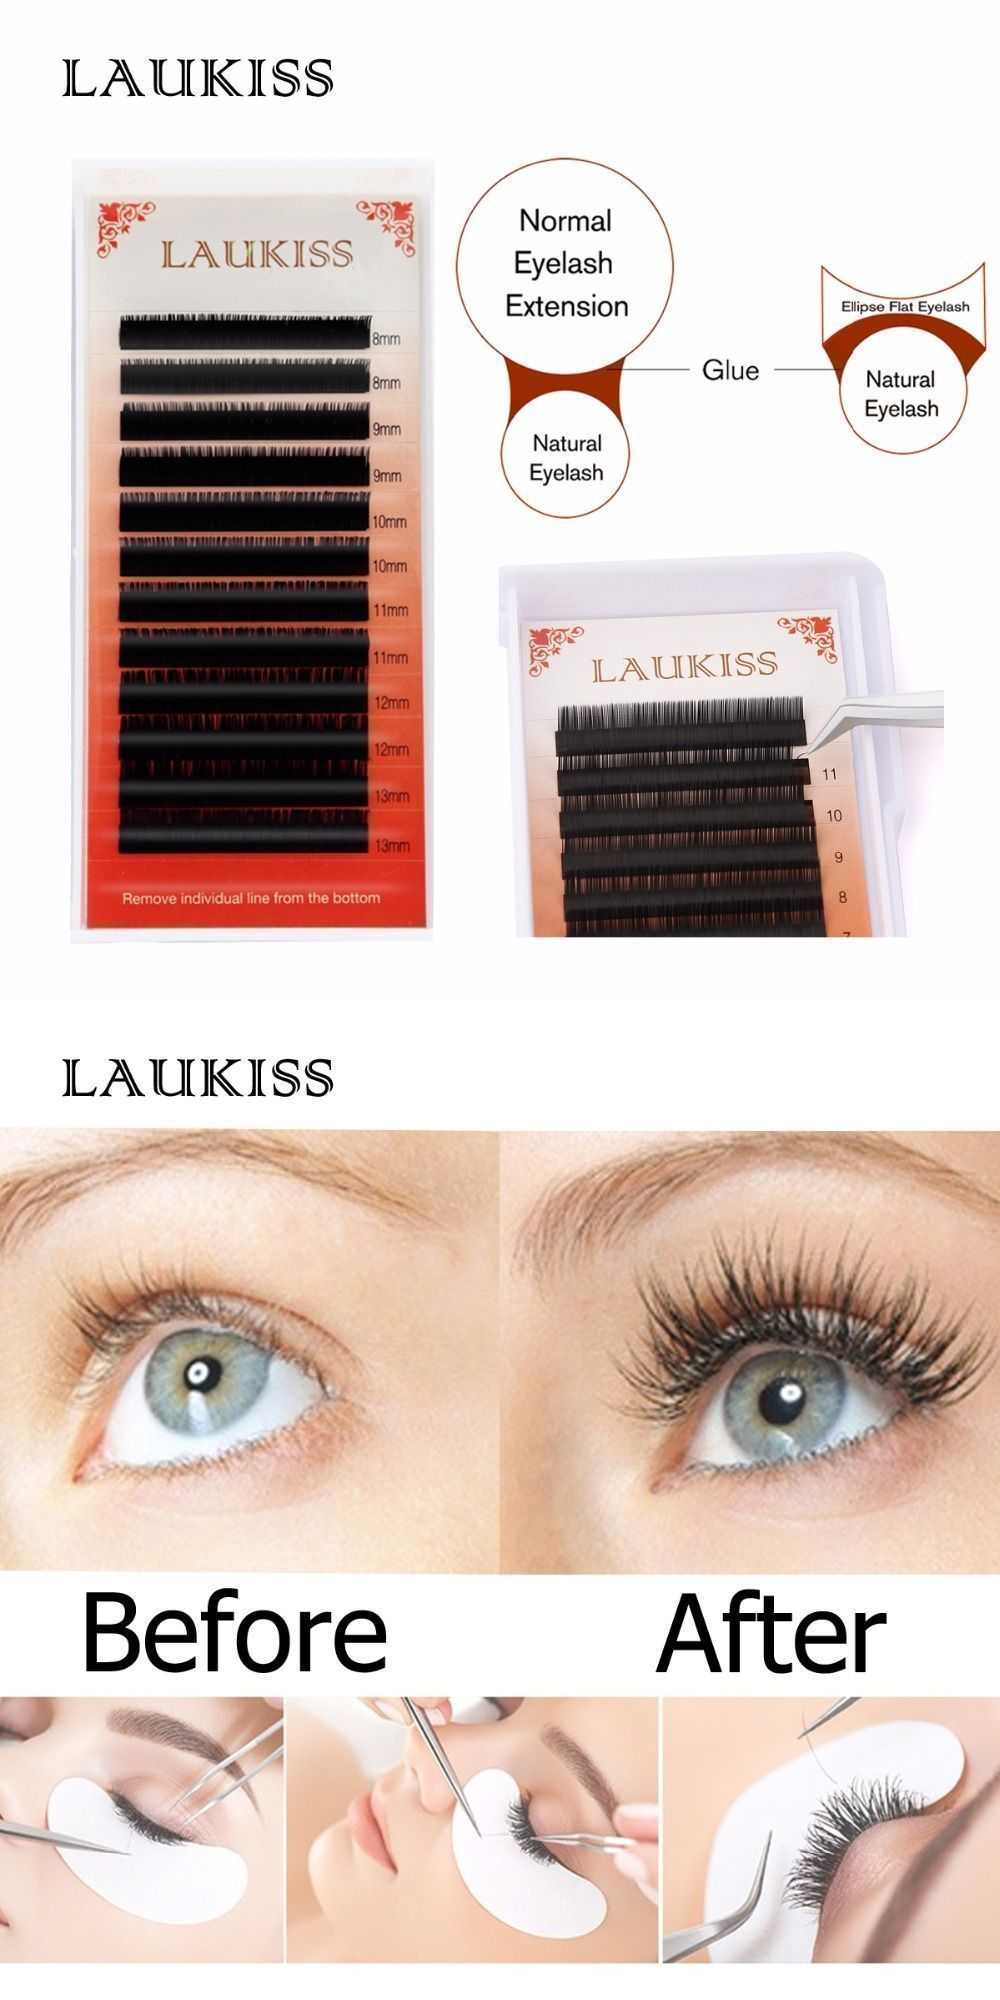 4ba98c4a0f2 12Lines/Case C D Curl Flat False Eyelash Extensions Mix 3D 6D Make Up Professional  Soft Silk Permanent LAUKISS Fake Eyelashes #eyelashextensions